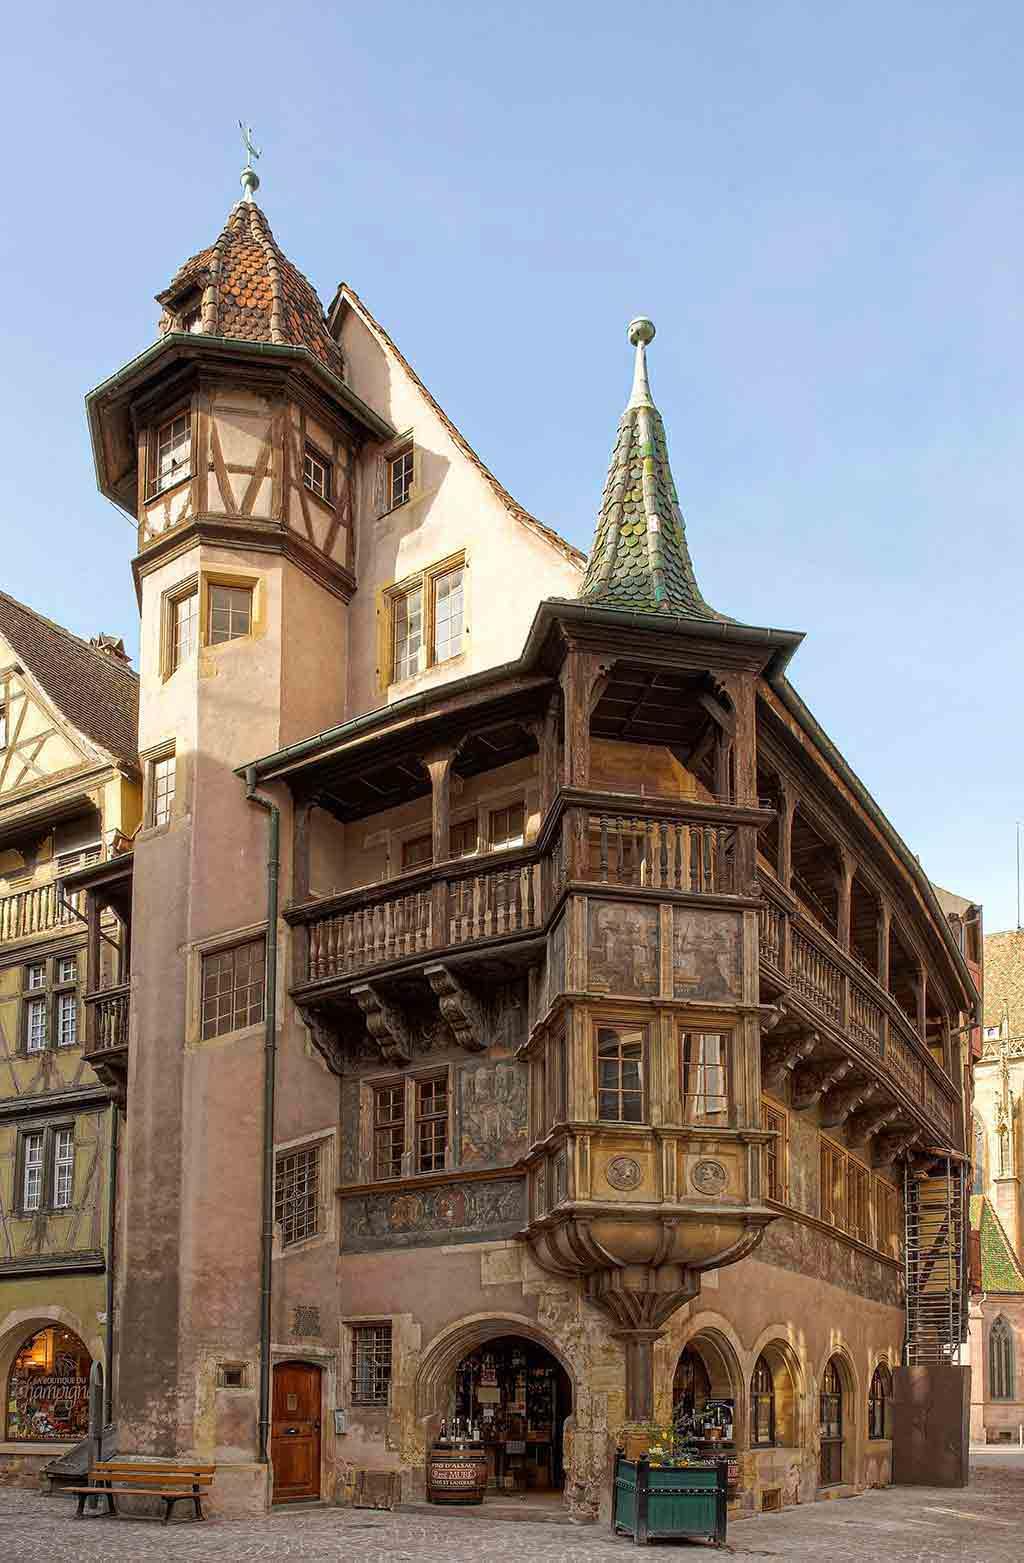 Maison Pfister in Colmar by Eric Gaba/Wikimedia.org